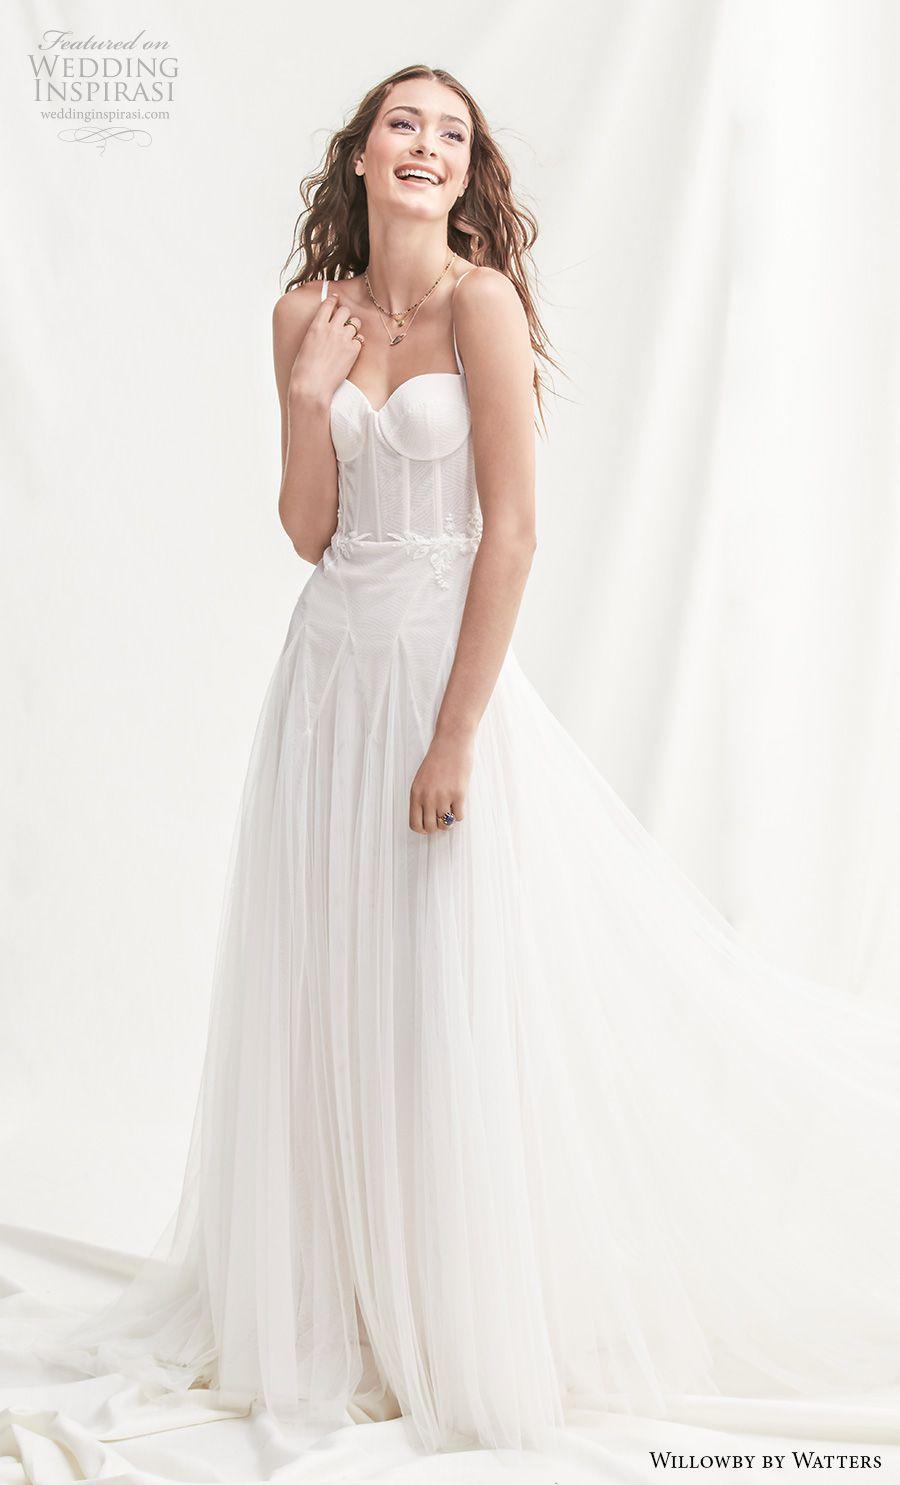 Willowby By Watters Spring 2019 Wedding Dresses Wedding Inspirasi Ball Gown Wedding Dress Boho Bridal Gowns A Line Wedding Dress,Sparkly Glitter Ball Gown Wedding Dress